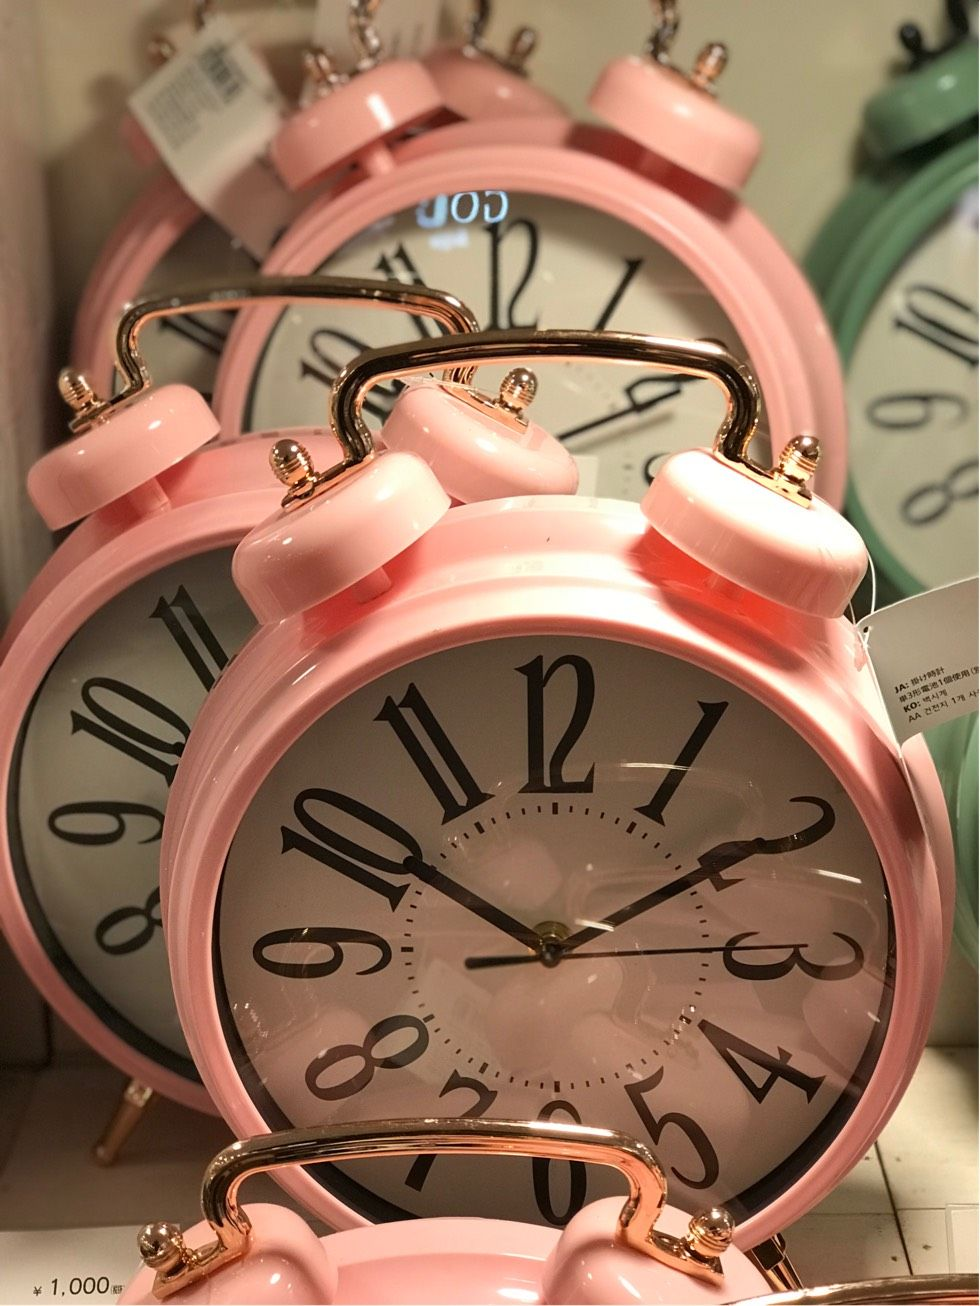 official photos 2c38a 14401 おっきくてかわいい時計入荷しました❤ | ららぽーとTOKYO-BAY ...